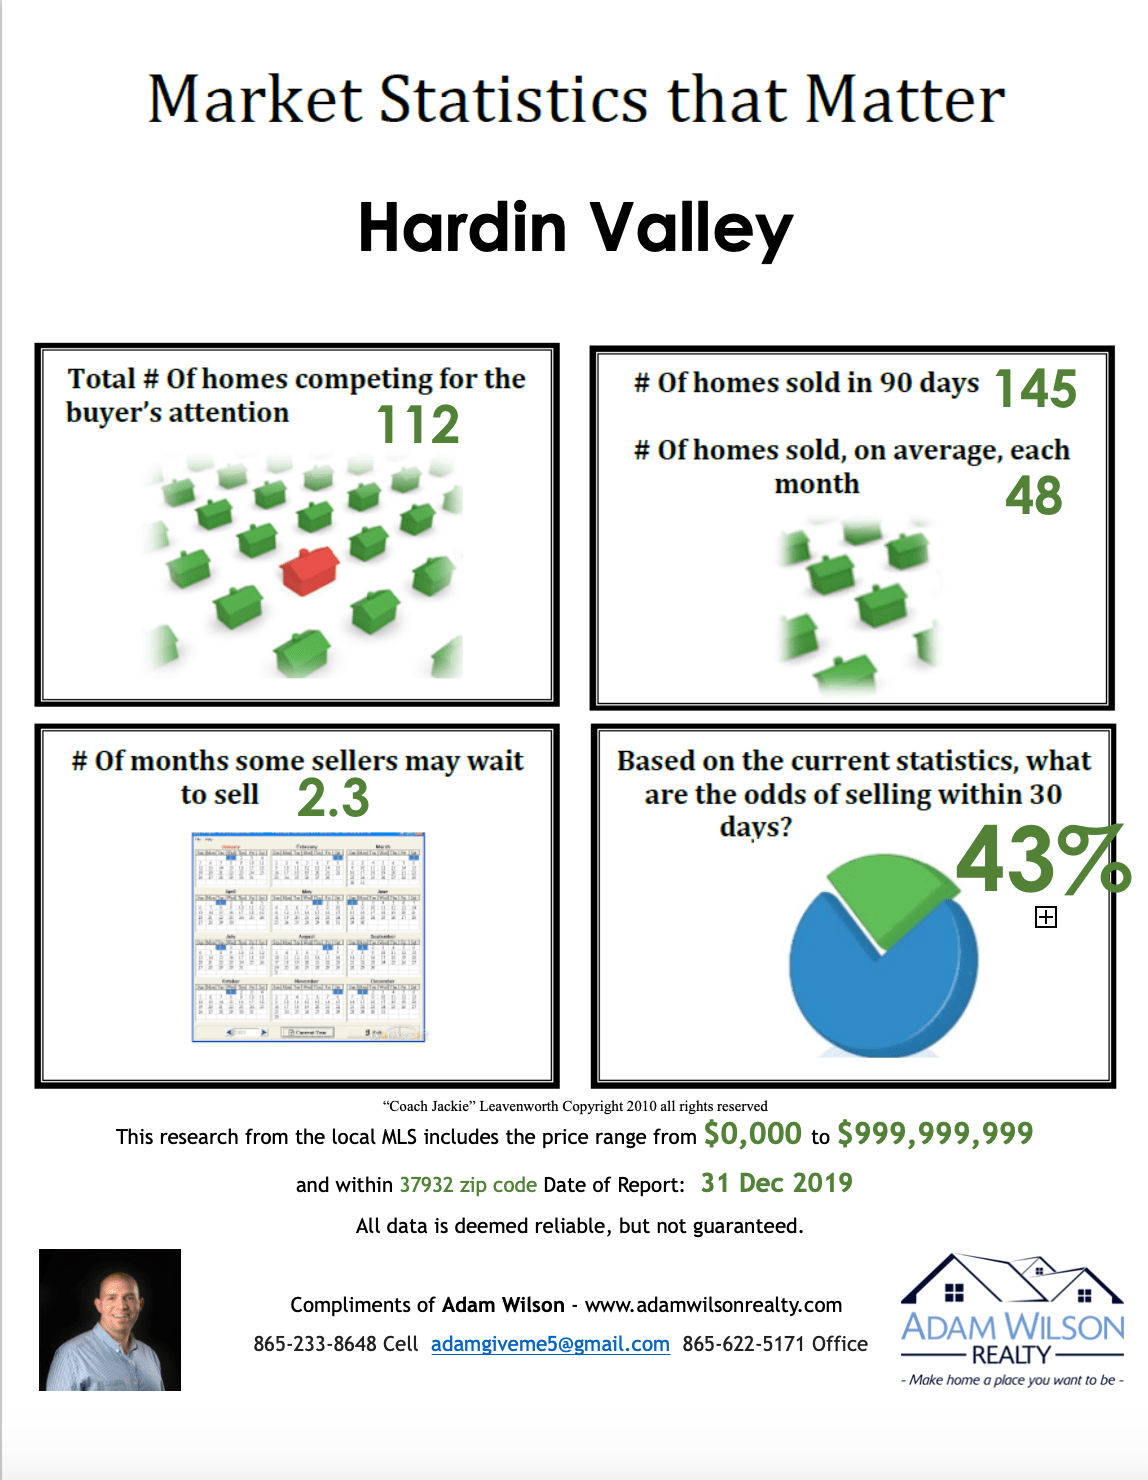 Hardin Valley Real Estate Market Update – Dec 2019